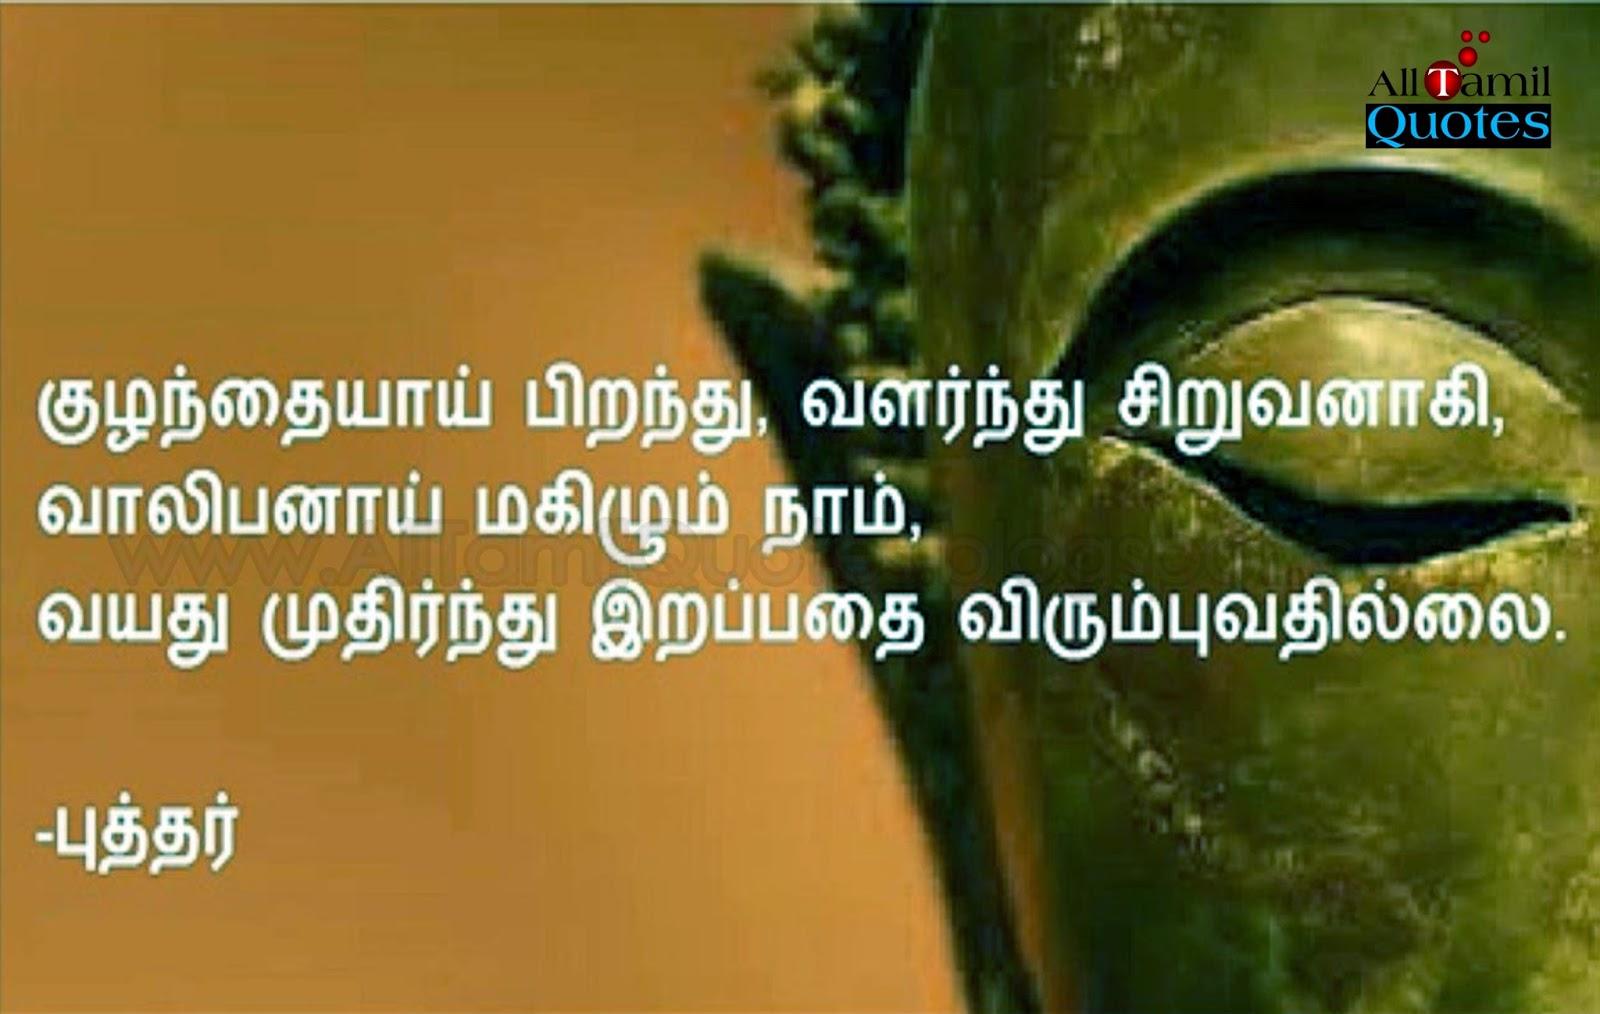 goutama buddha inspirational quotes in tamil language